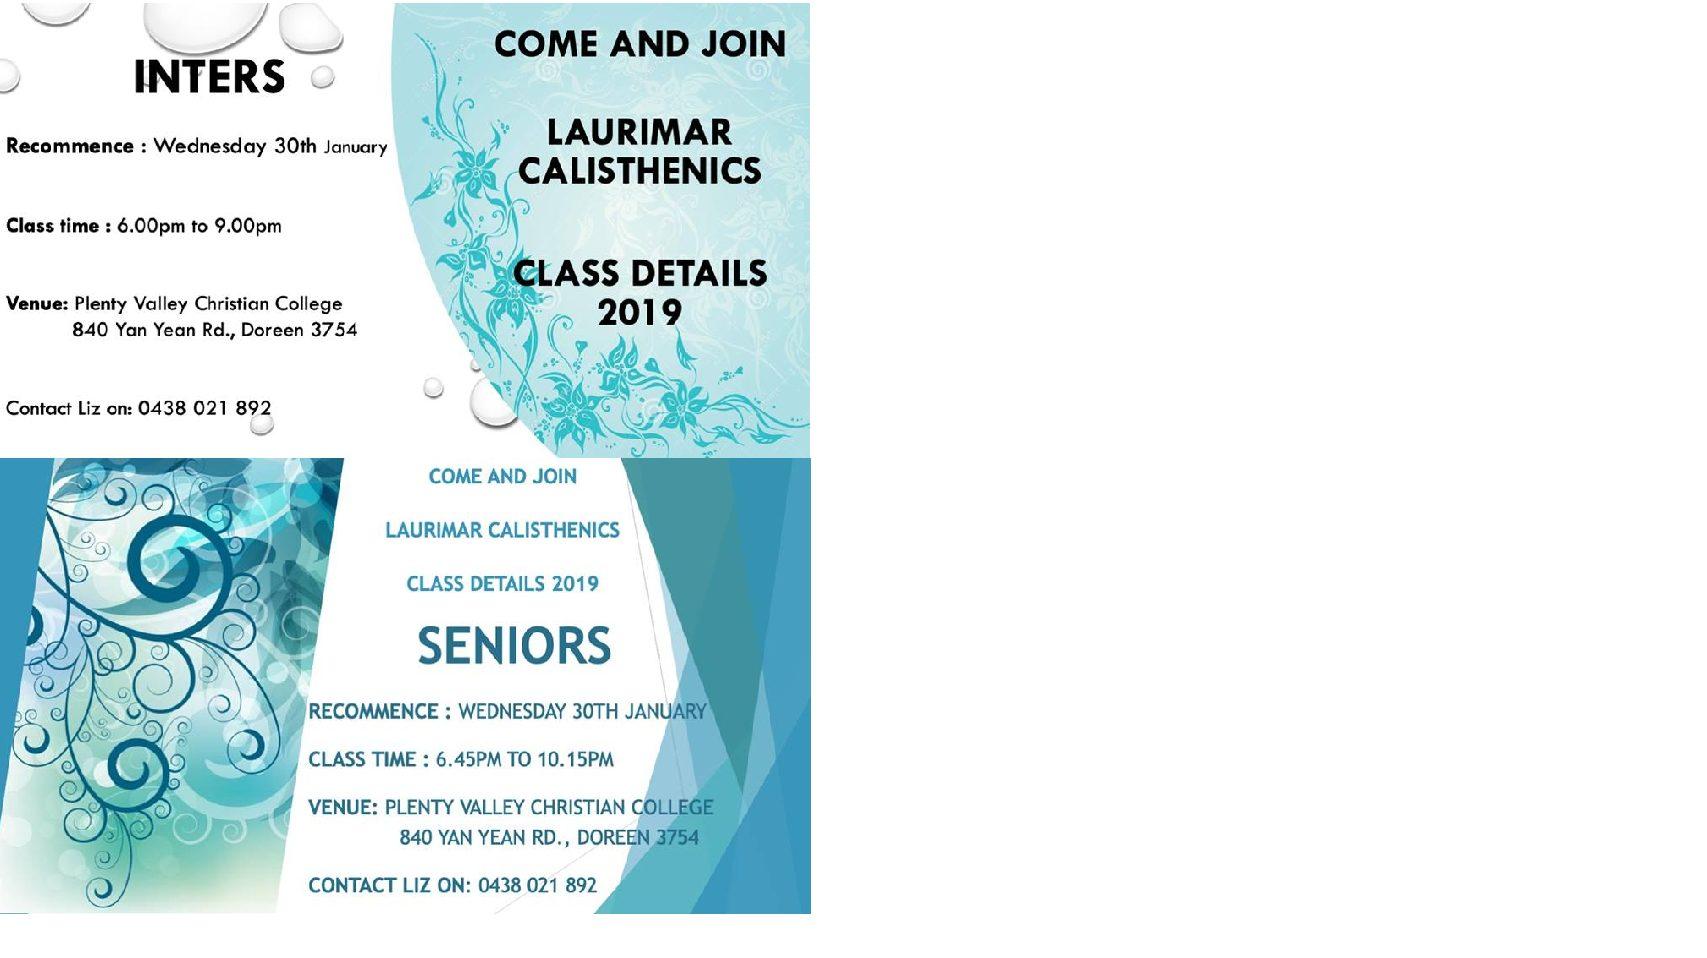 Intermediates and Seniors